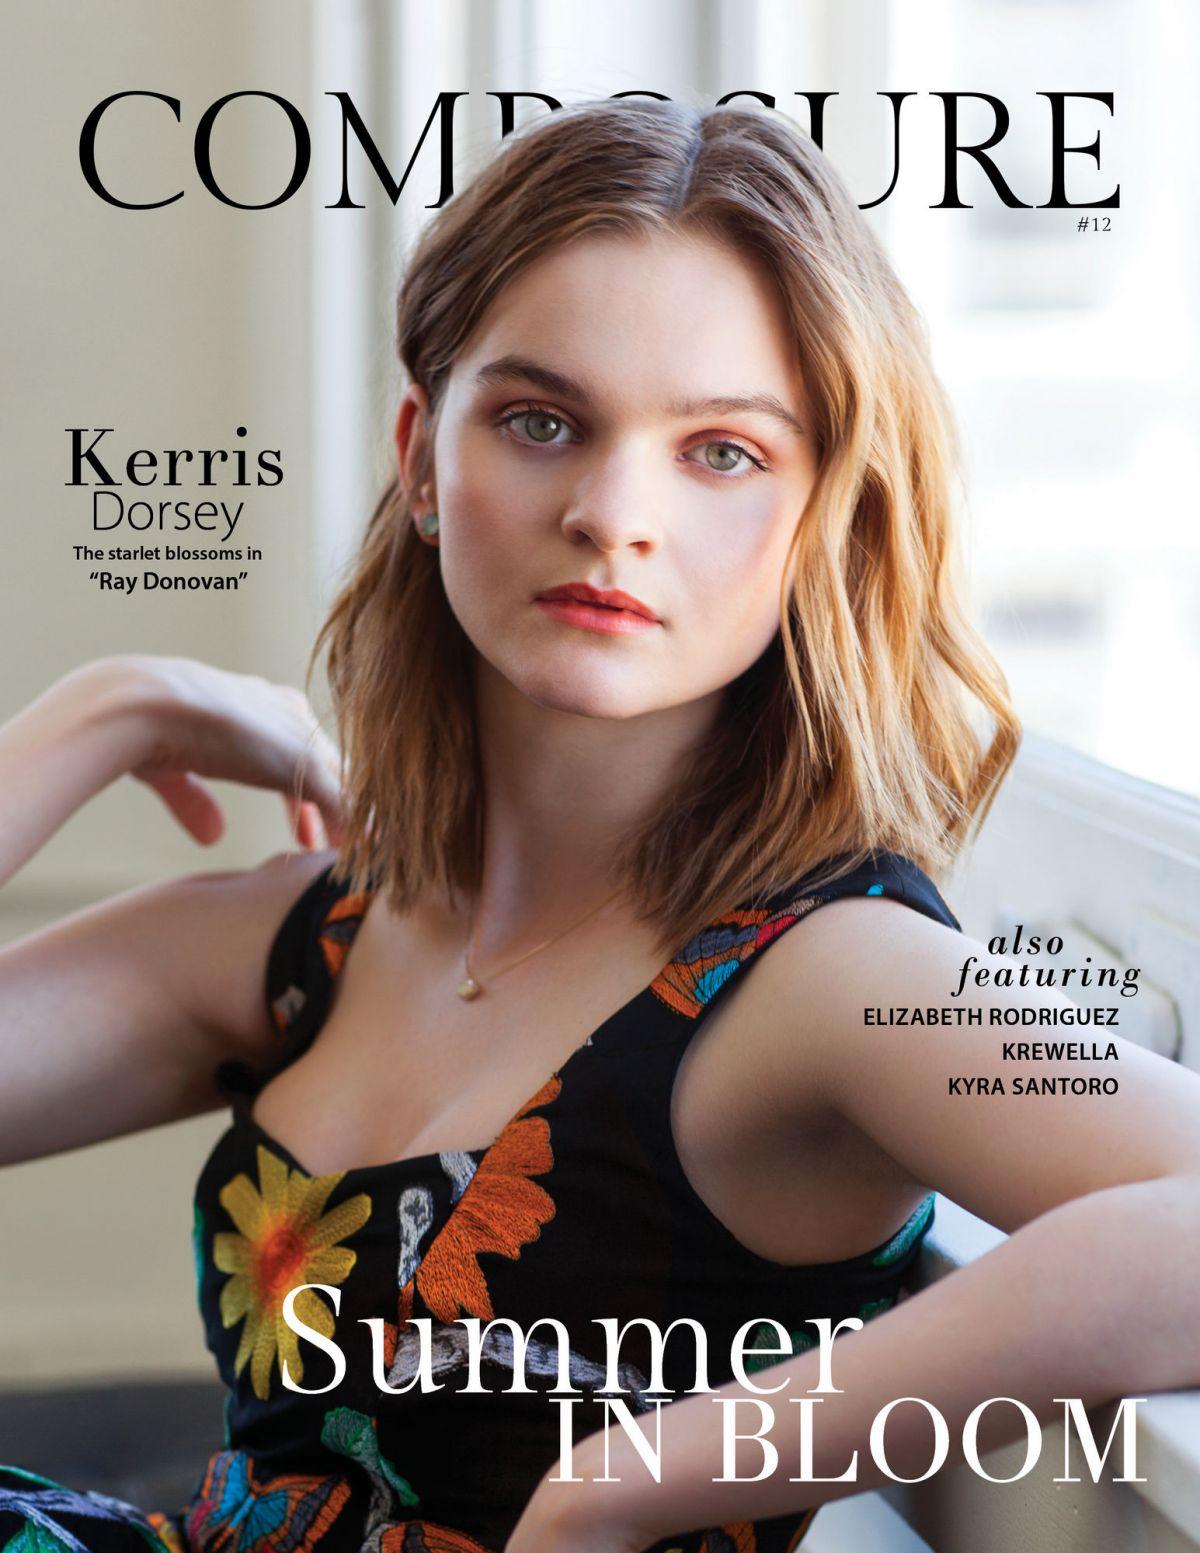 KERRIS DORSEY in Composure Magazine, Issue #12 September 2016